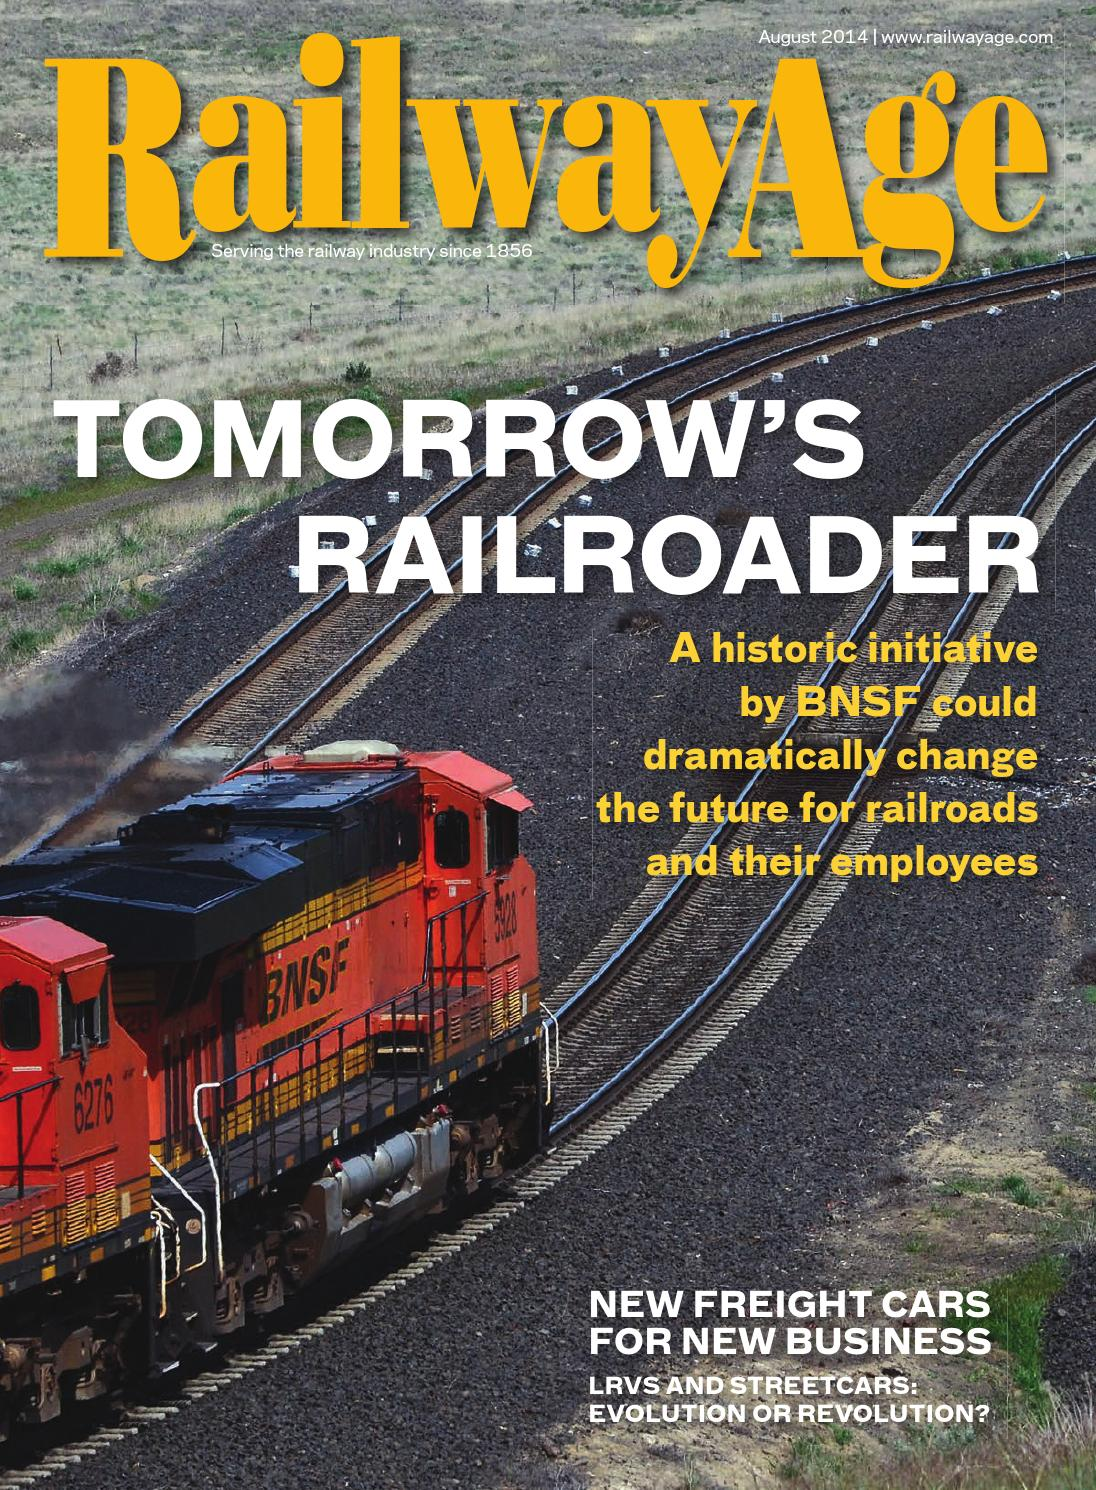 August 2014 Railway Age by Railway Age - issuu